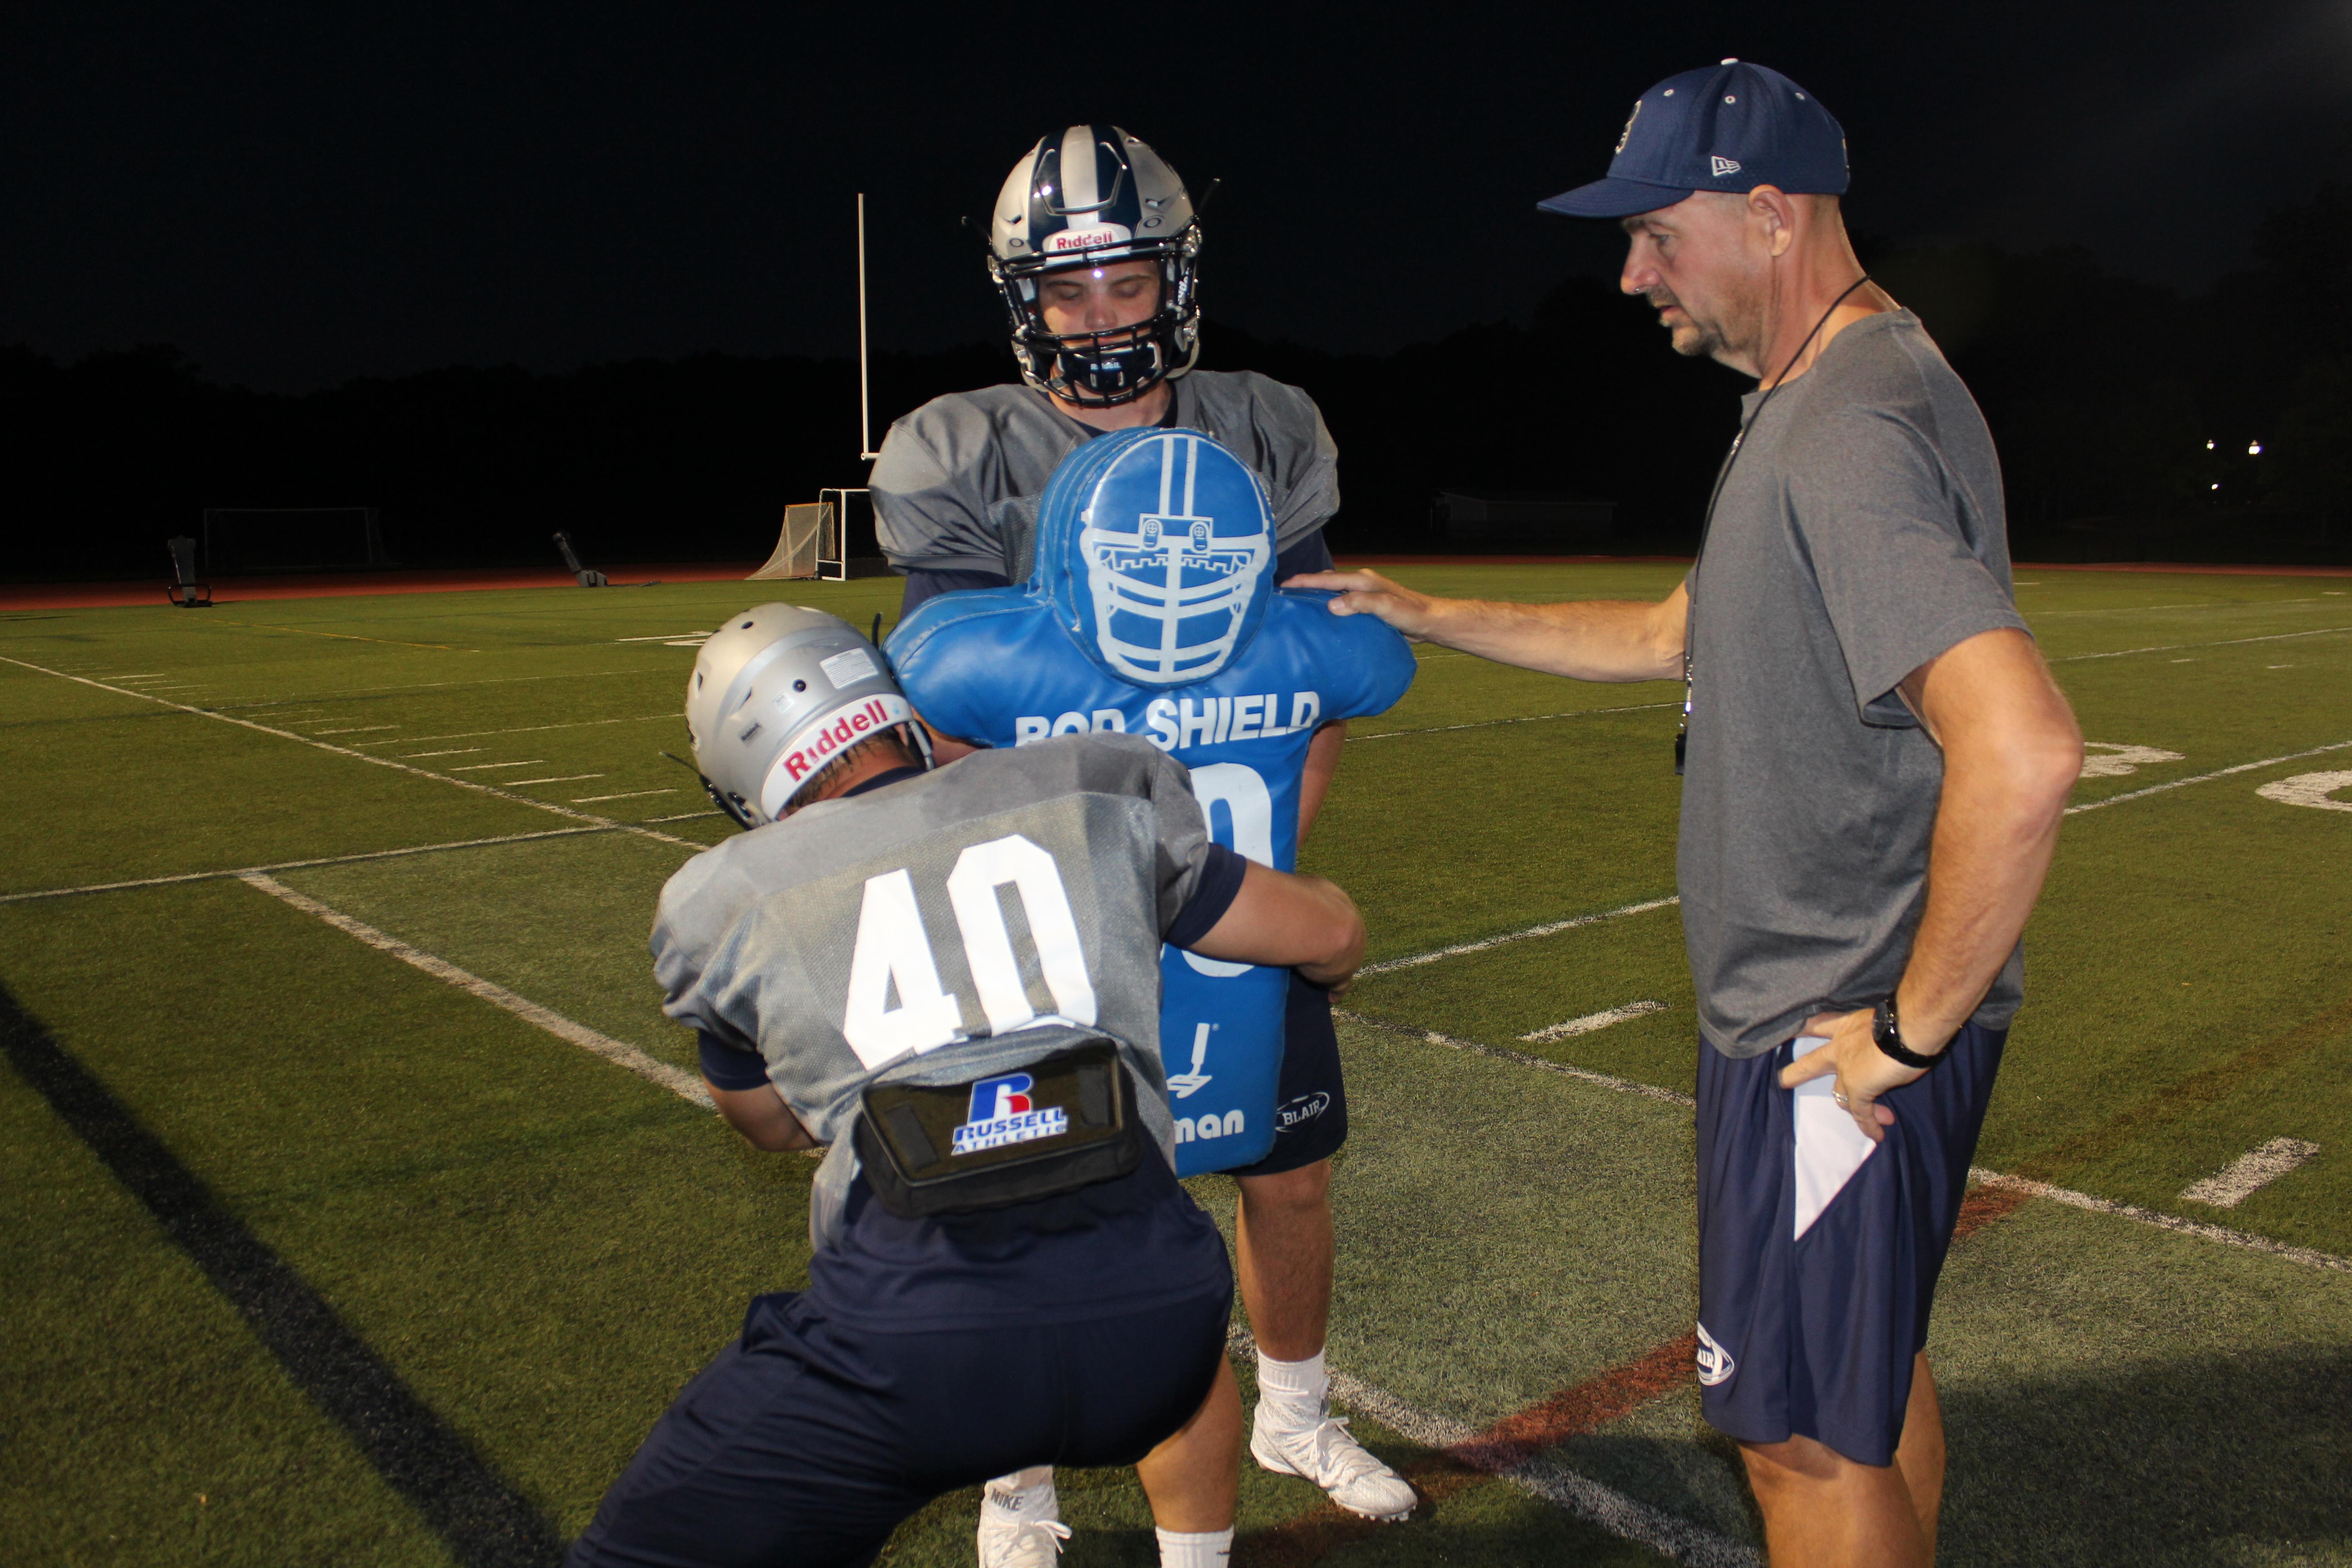 Blair Academy coach Jim Saylor works with Coach Jim Saylor with senior captains Nick Mosco and Chase Singletary and a tackling dummy (Photo: Blair Academy)